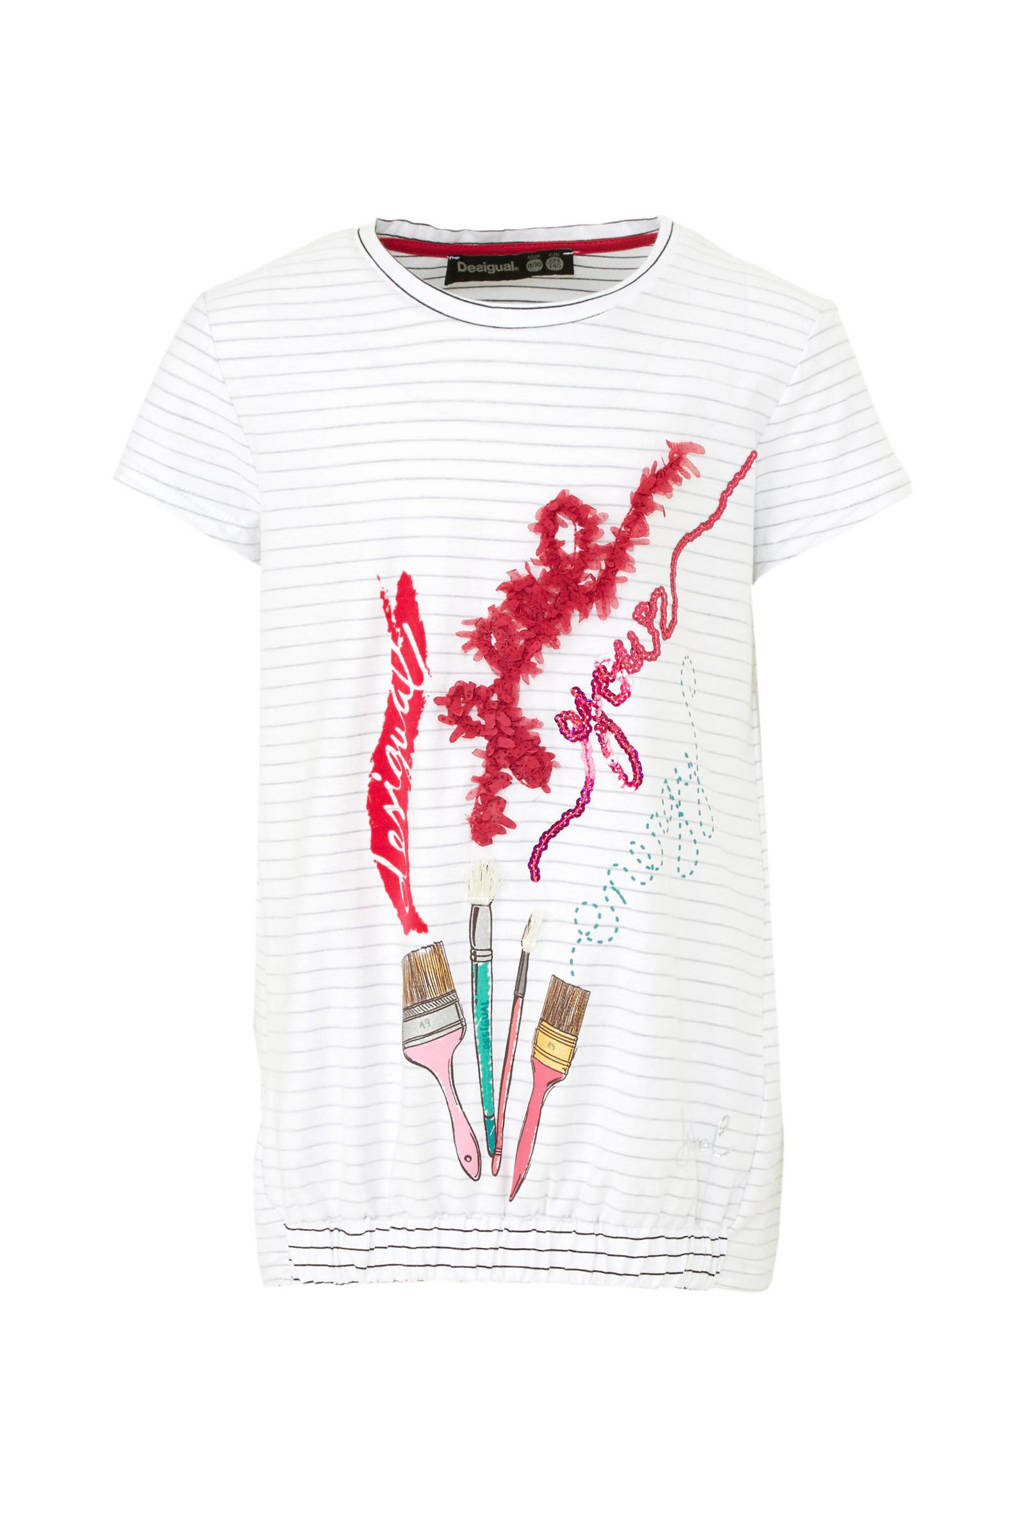 Desigual gestreept T-shirt wit/grijs/roze